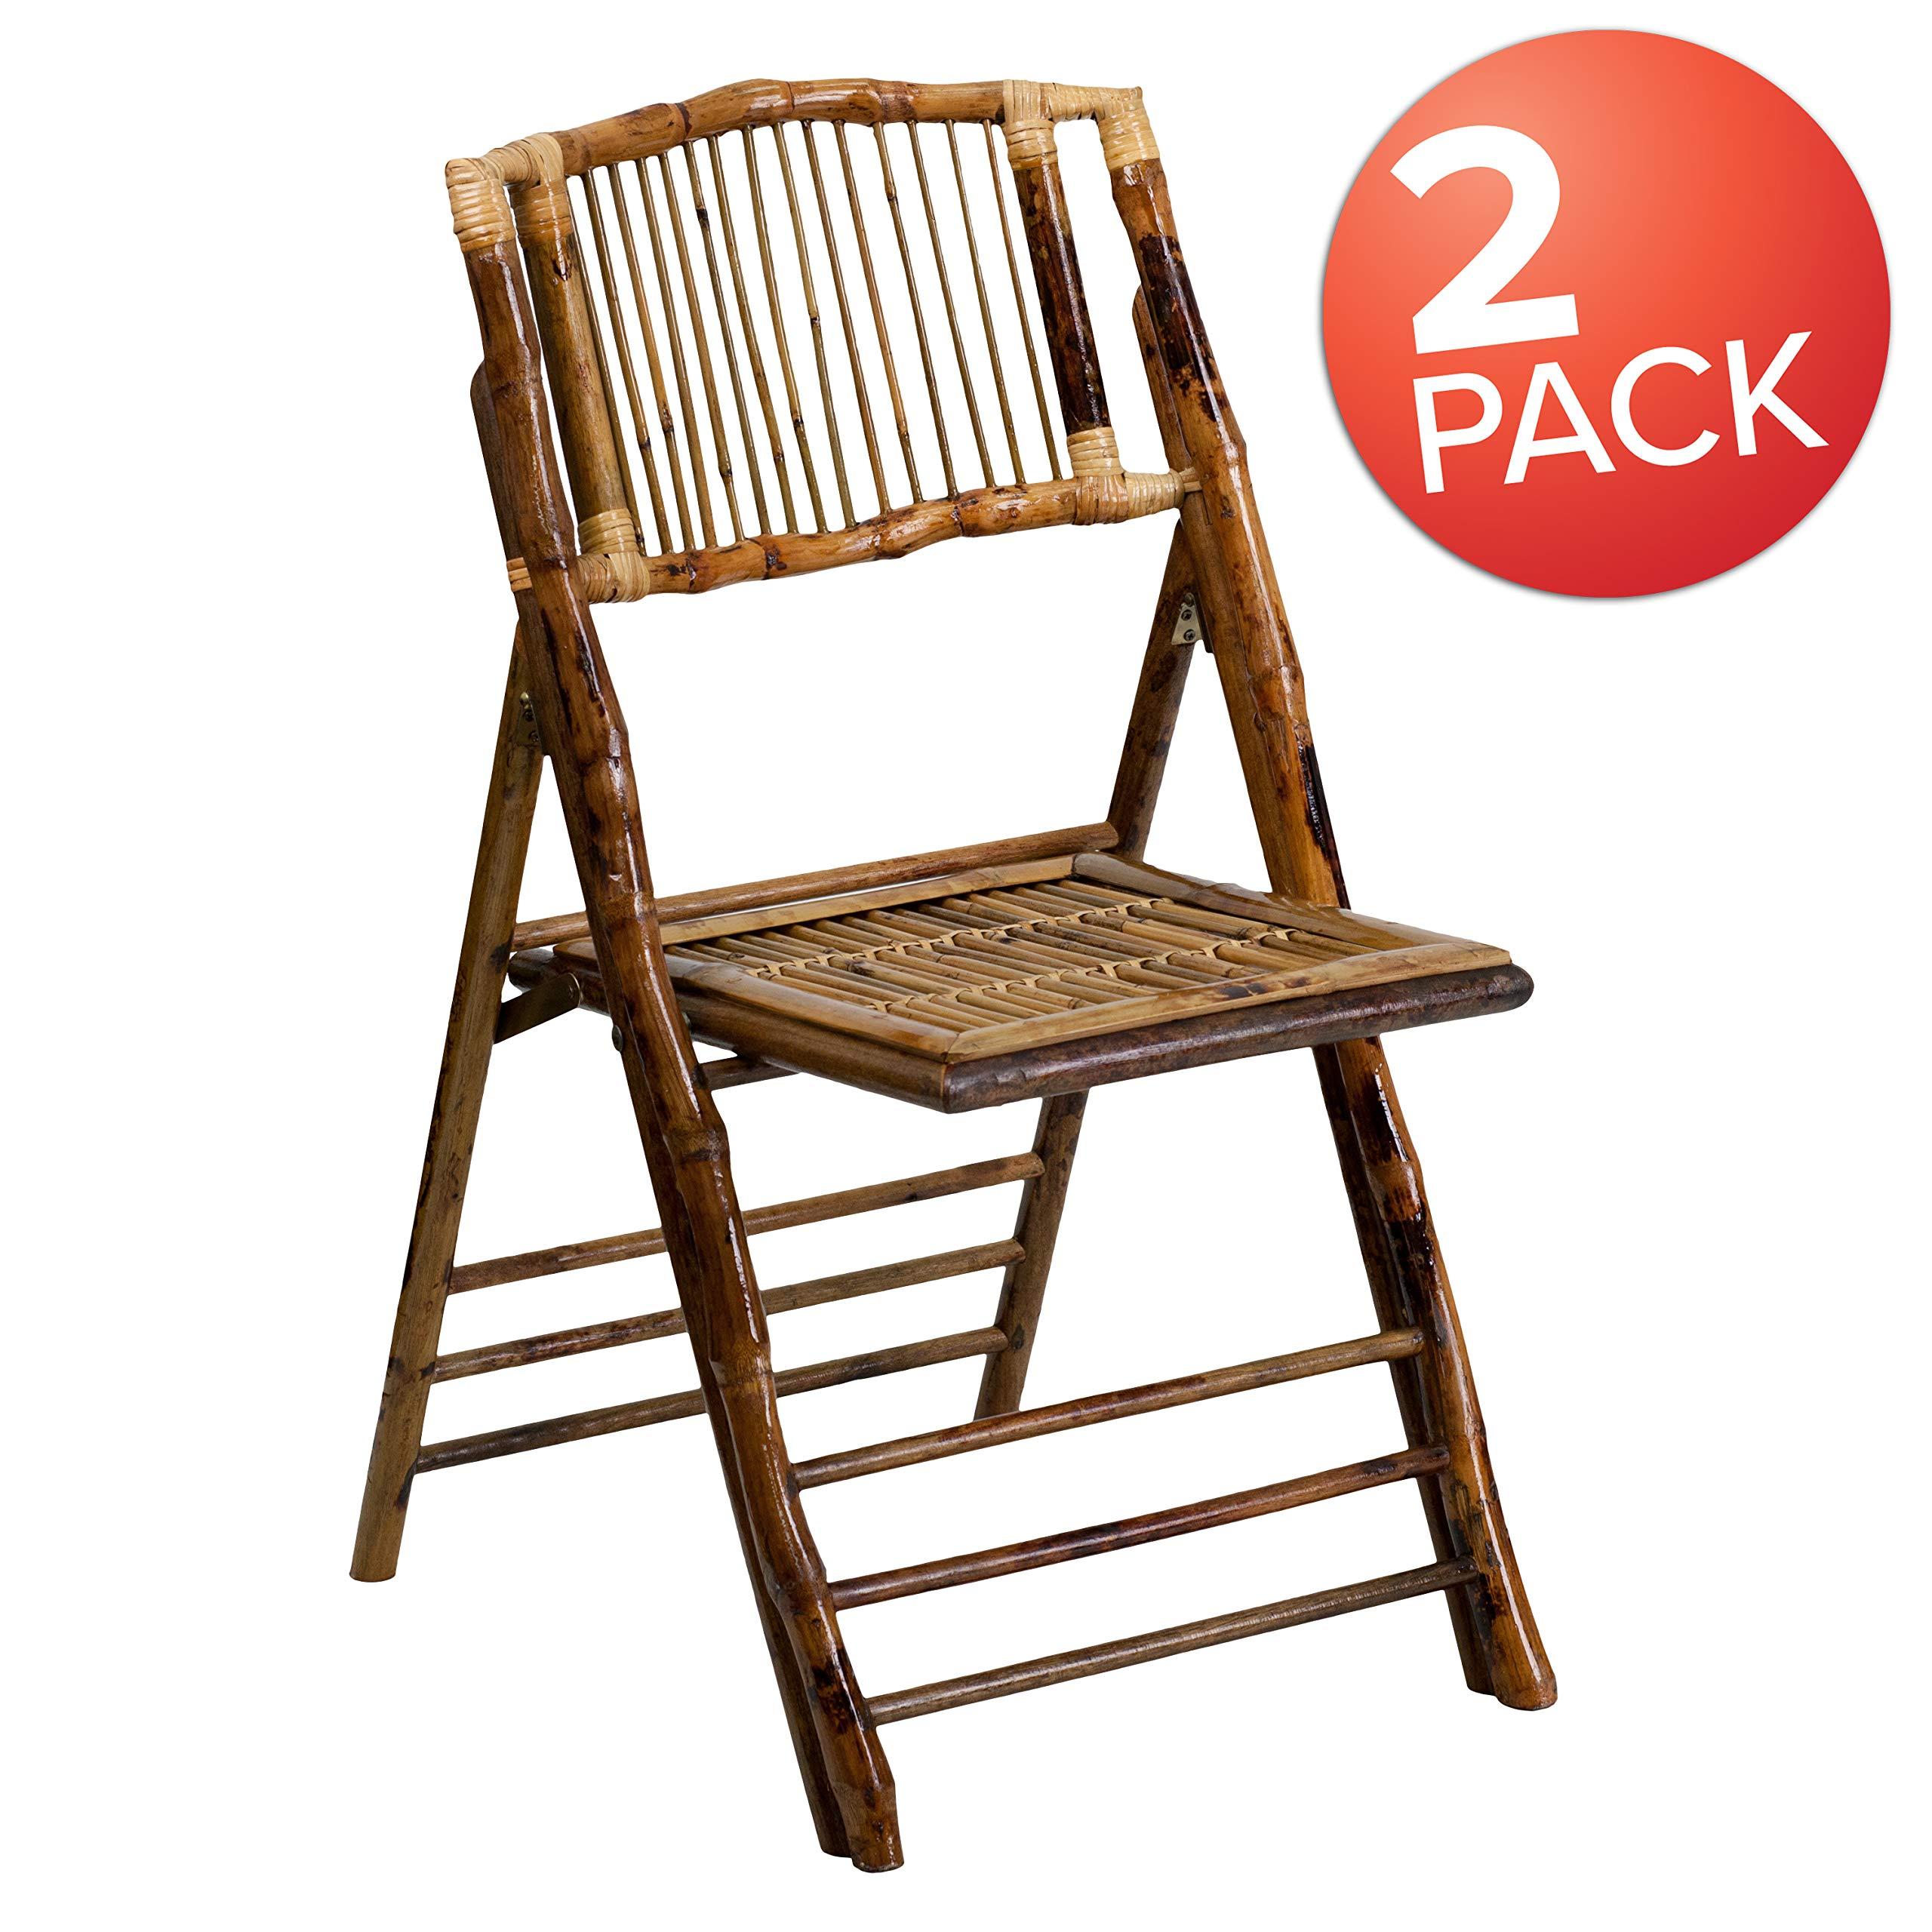 Flash Furniture Bamboo Folding Chairs |Set of 2 Bamboo Wood Folding Chairs by Flash Furniture